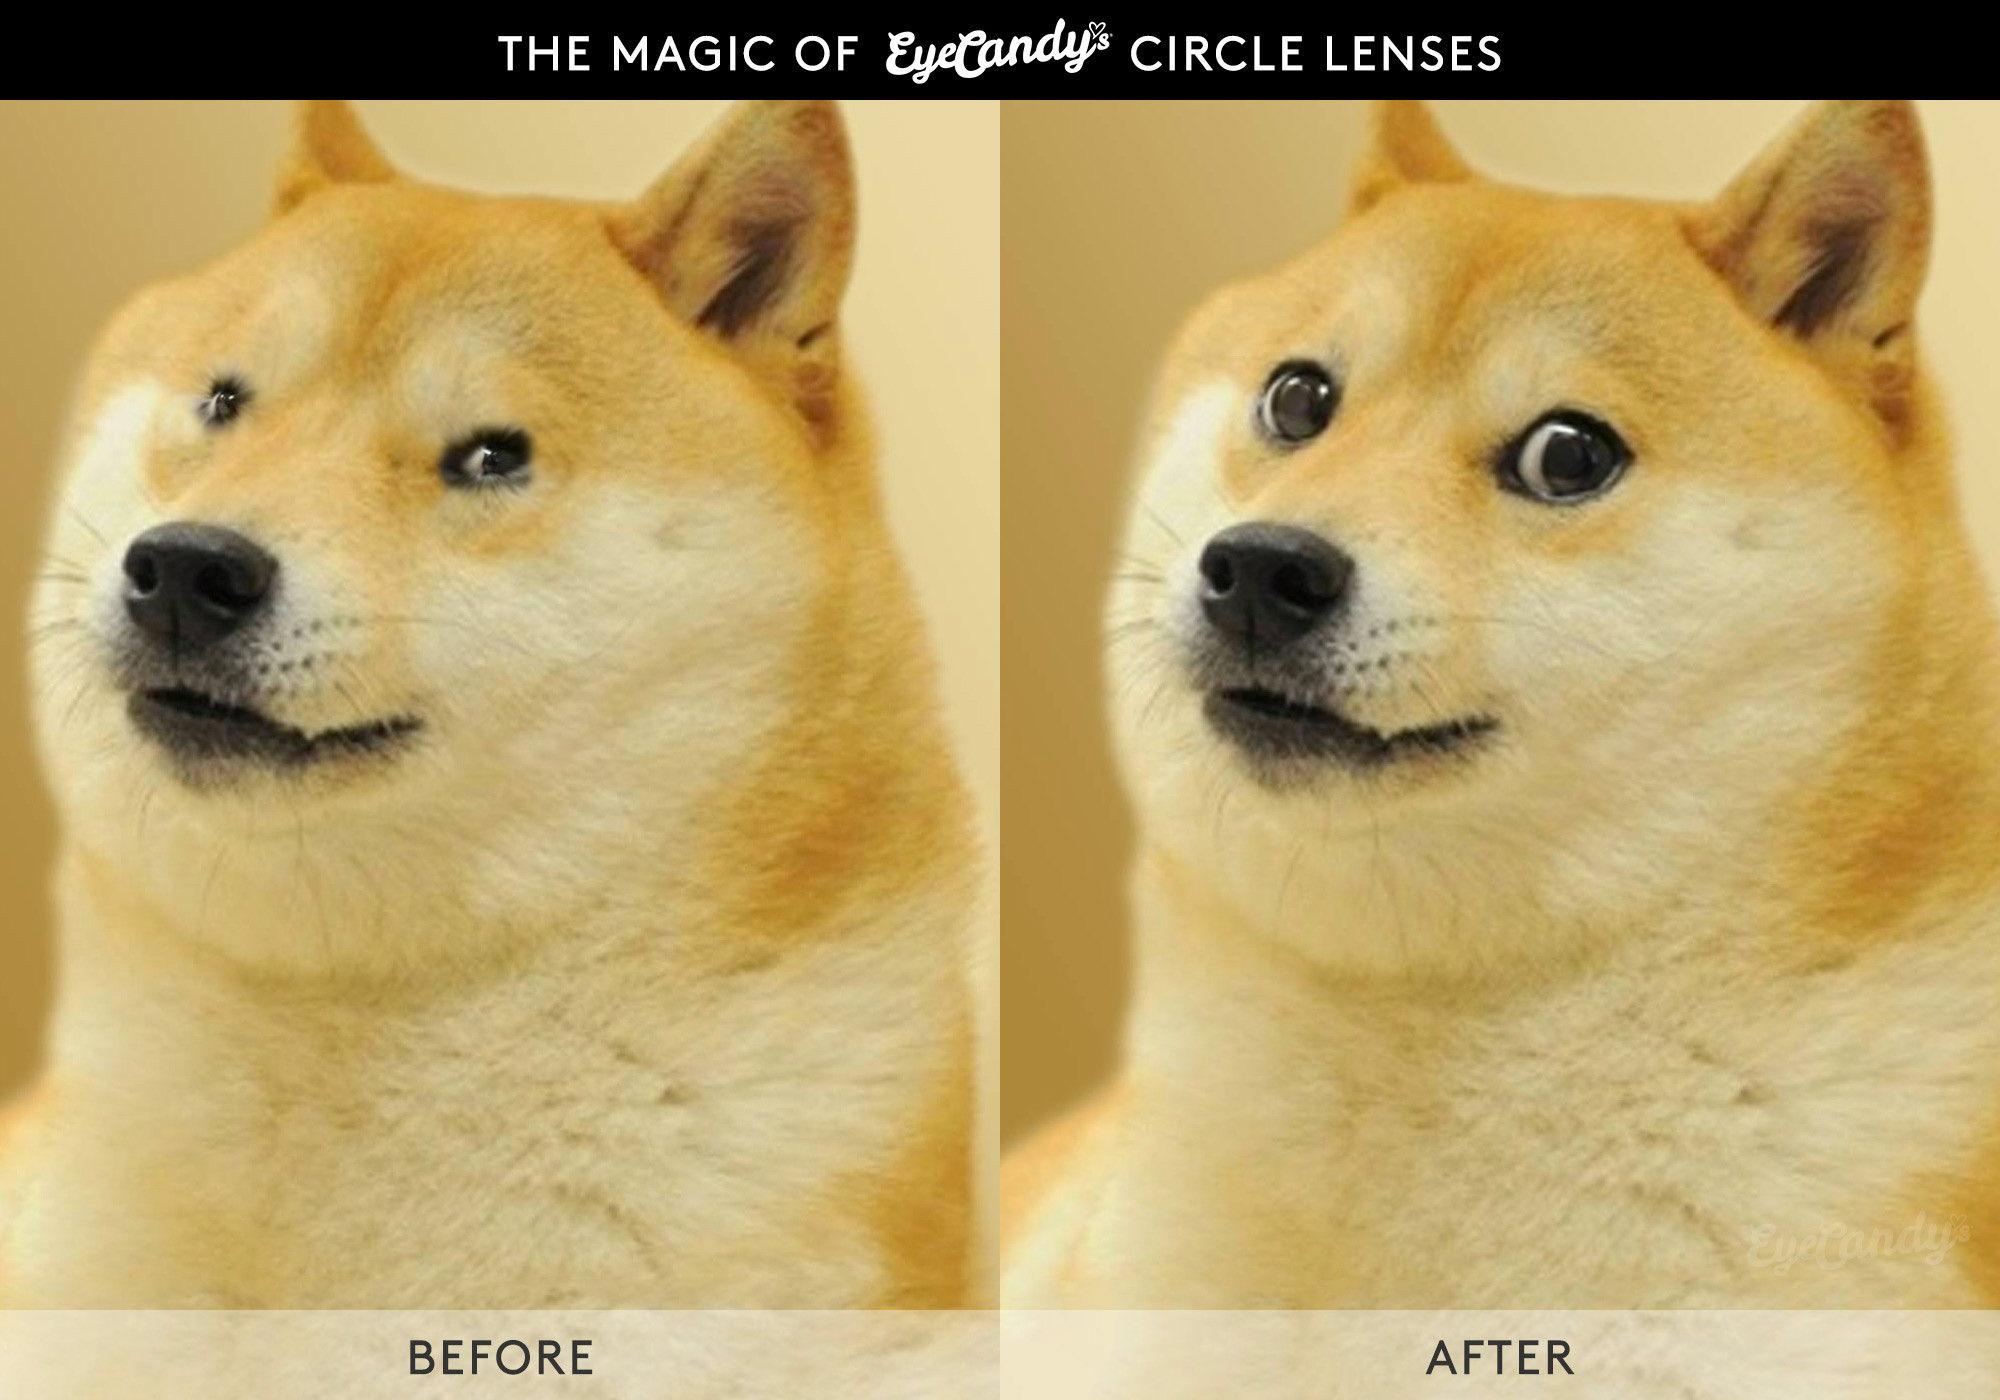 The magic of circle lenses!